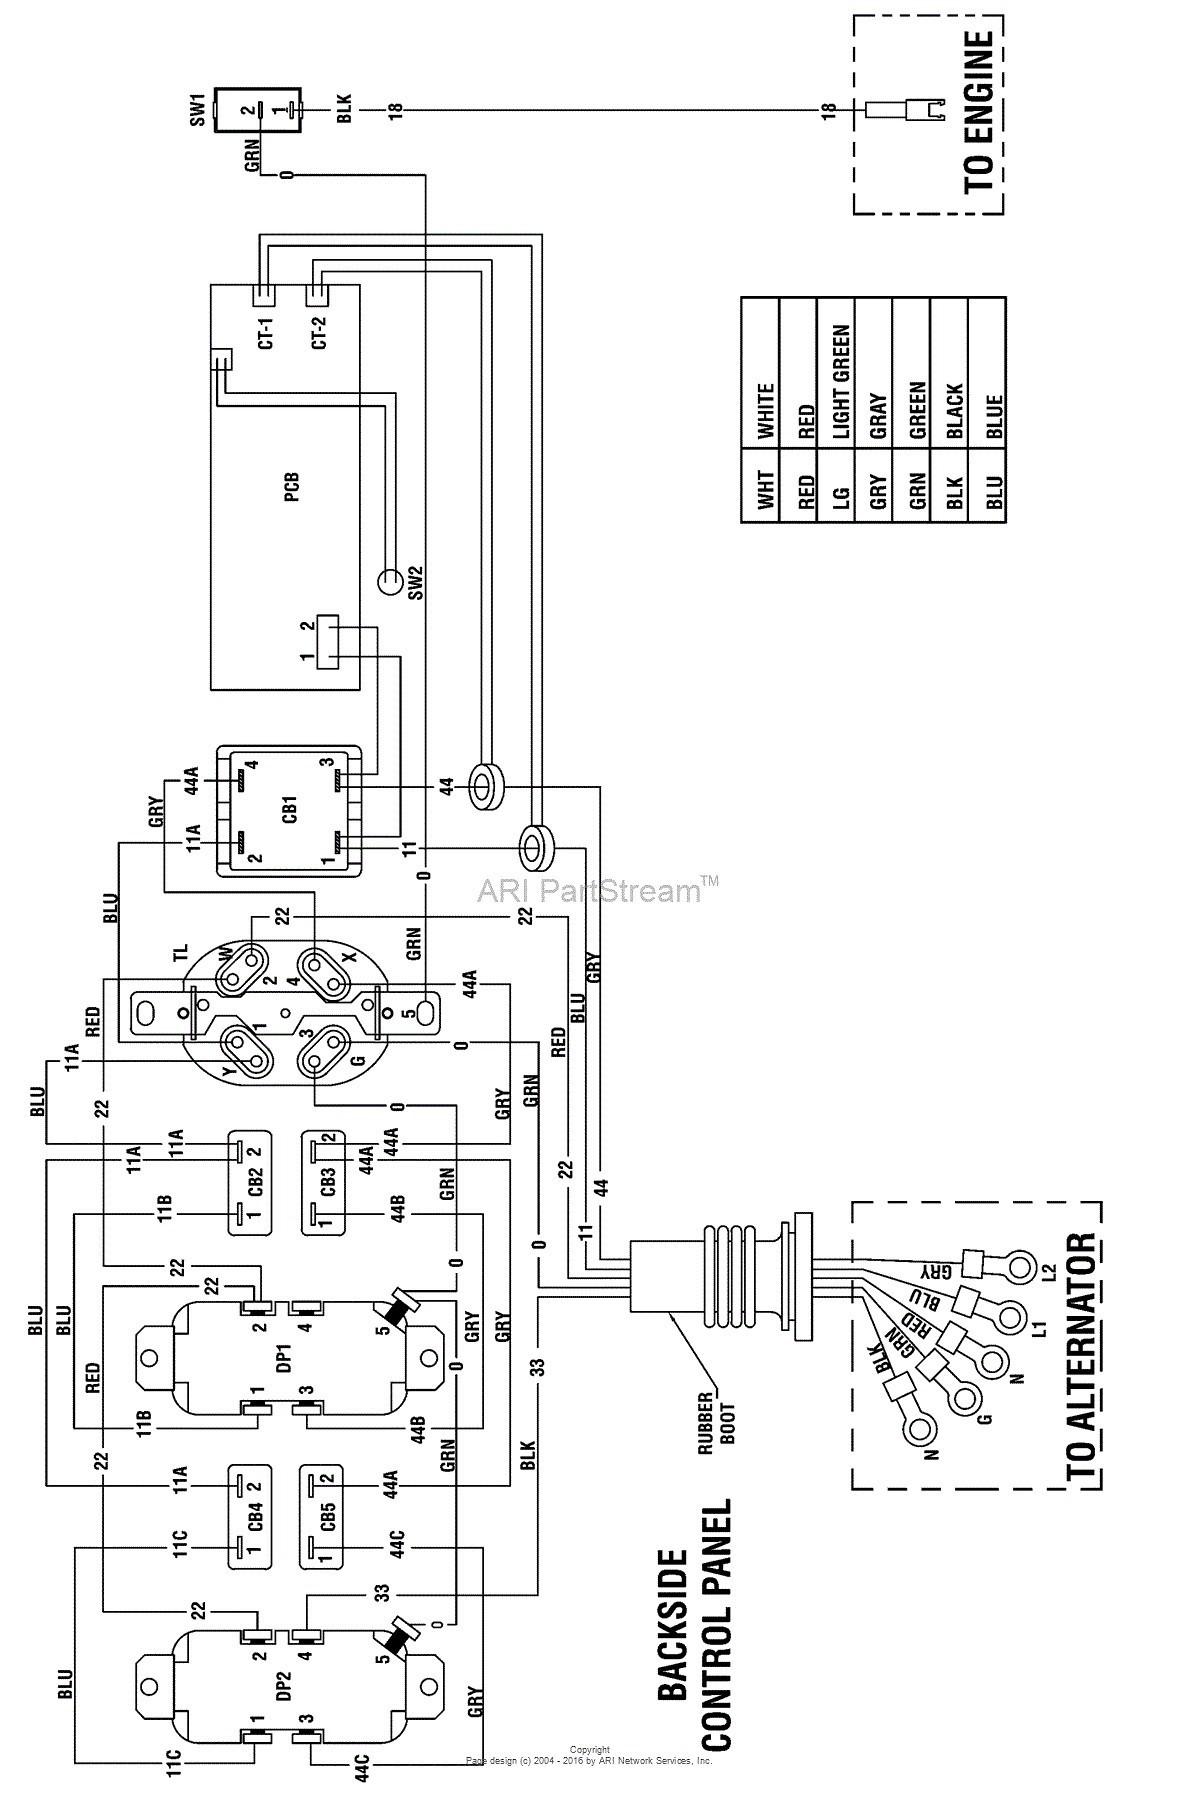 35 Briggs And Stratton Magneto Wiring Diagram